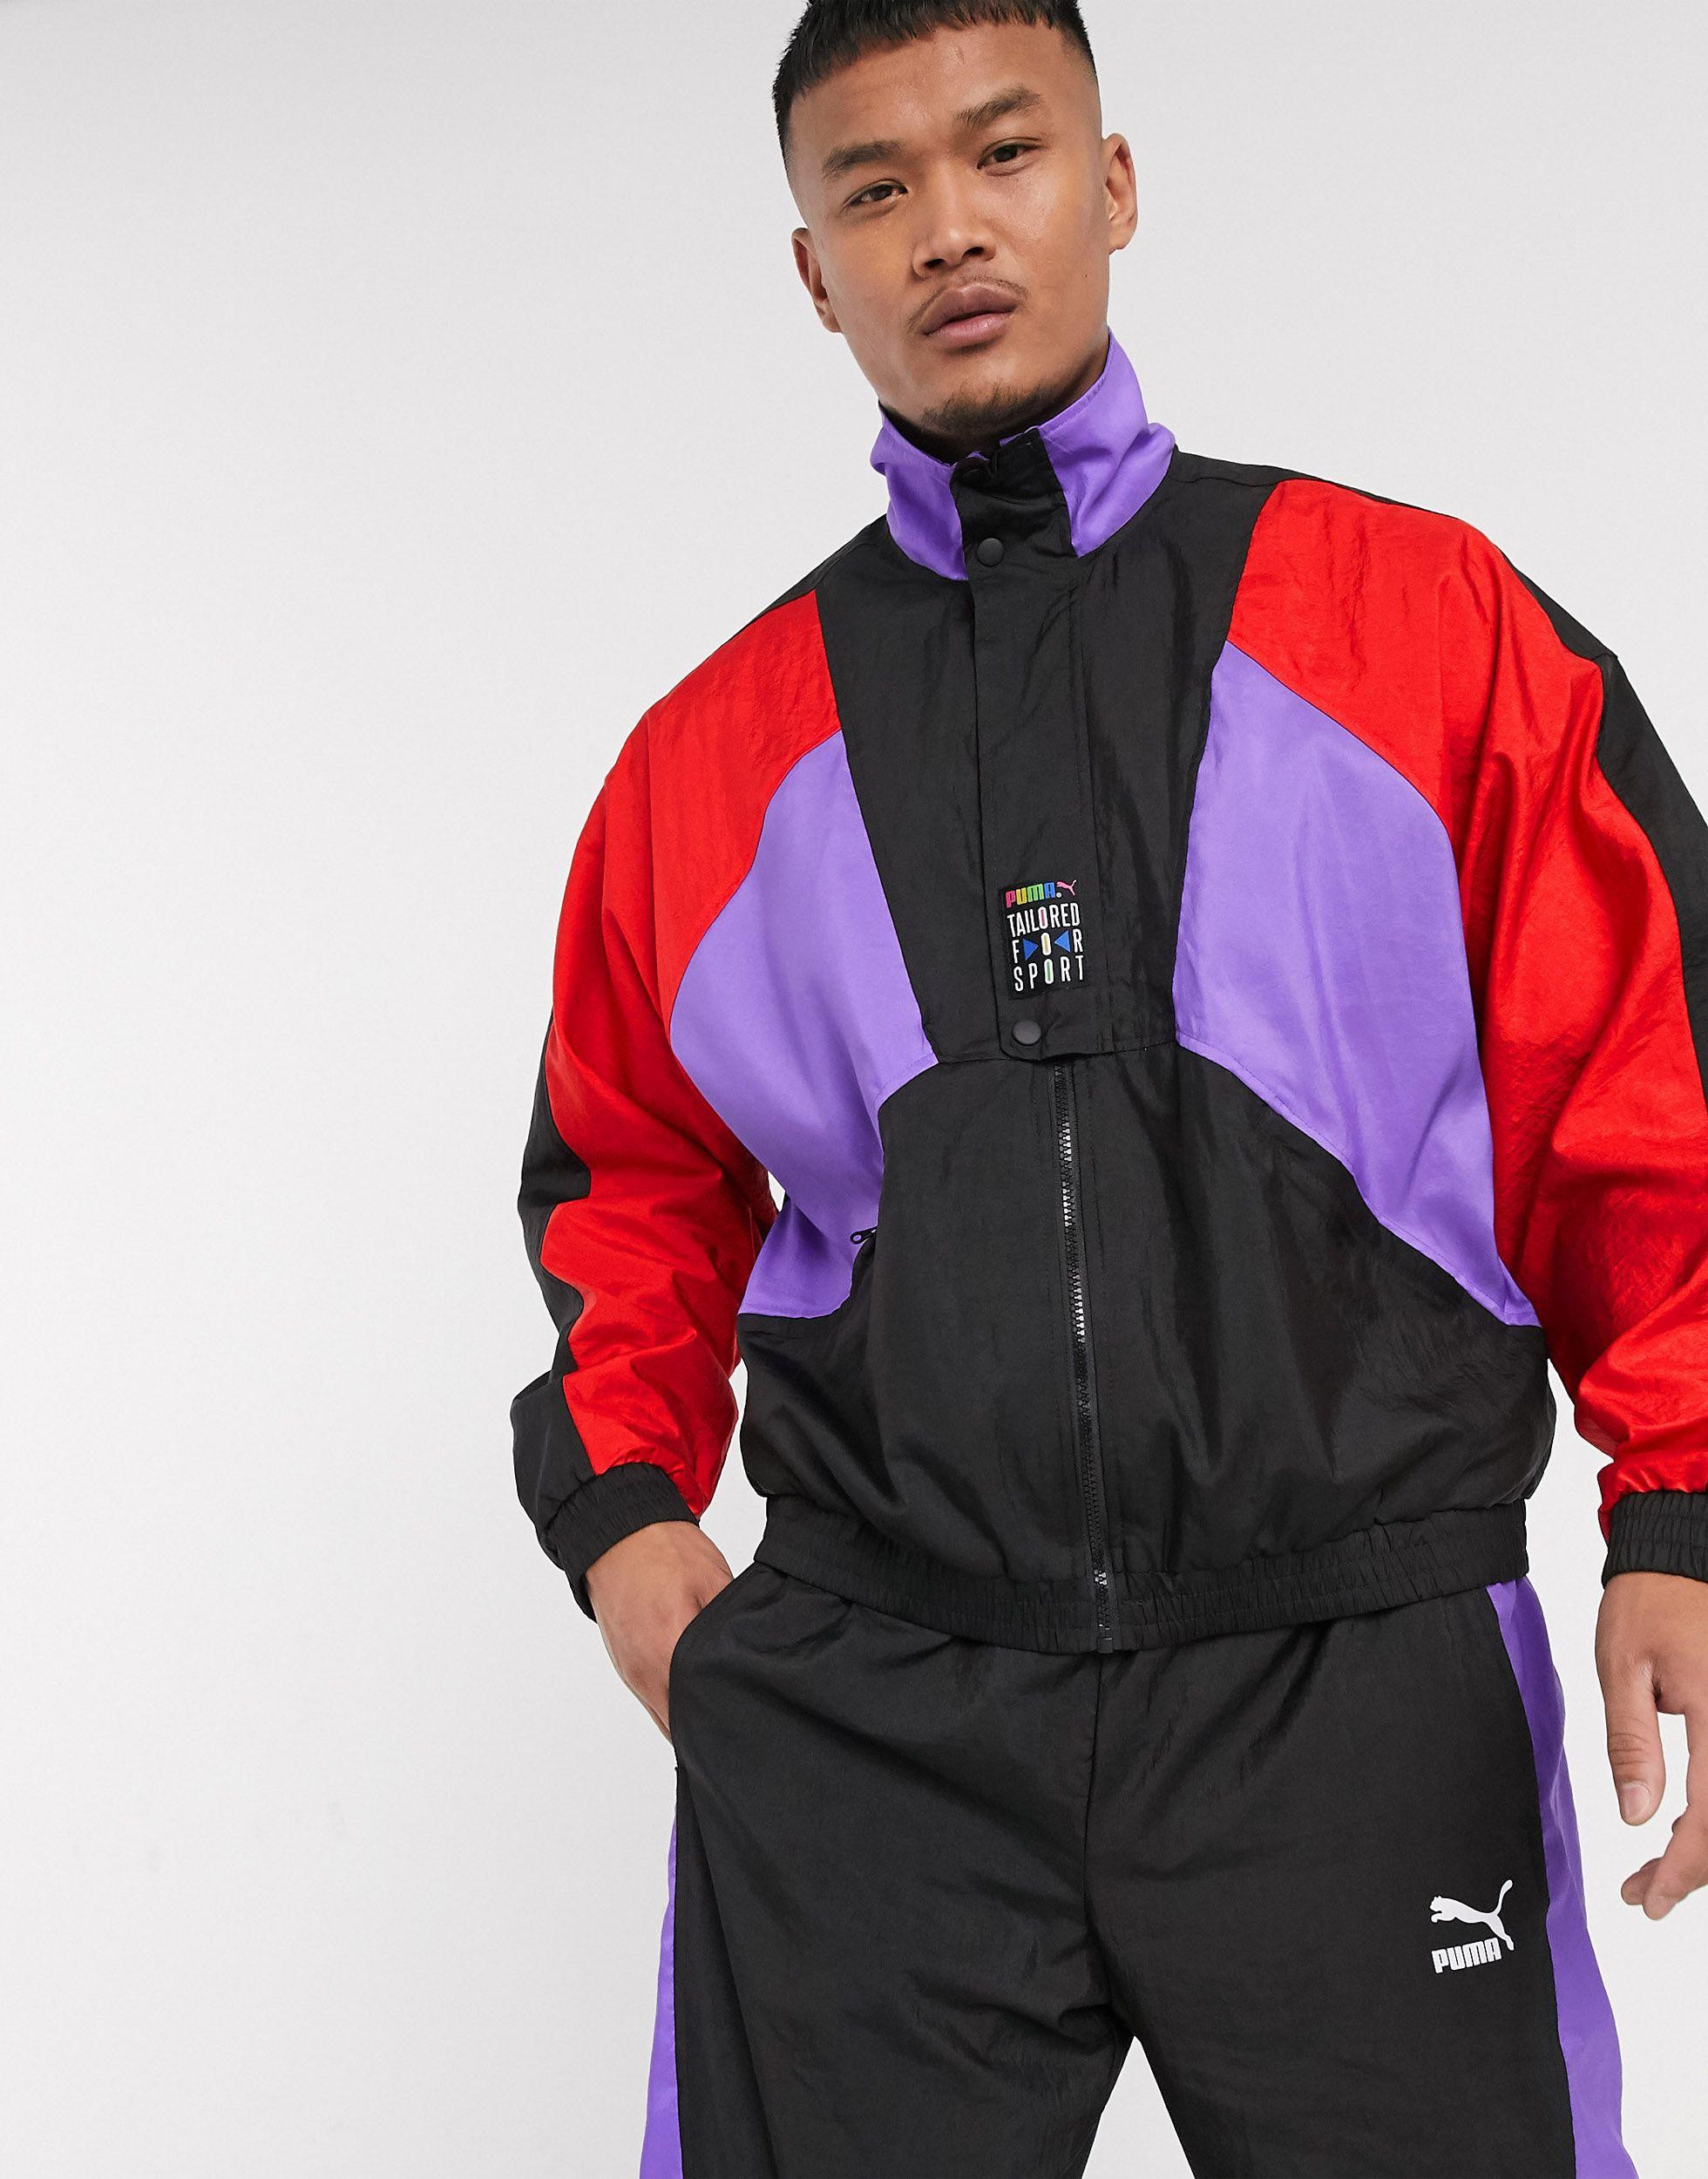 PUMA Synthetic Tfs Og Half Zip Track Jacket in Black for Men - Lyst